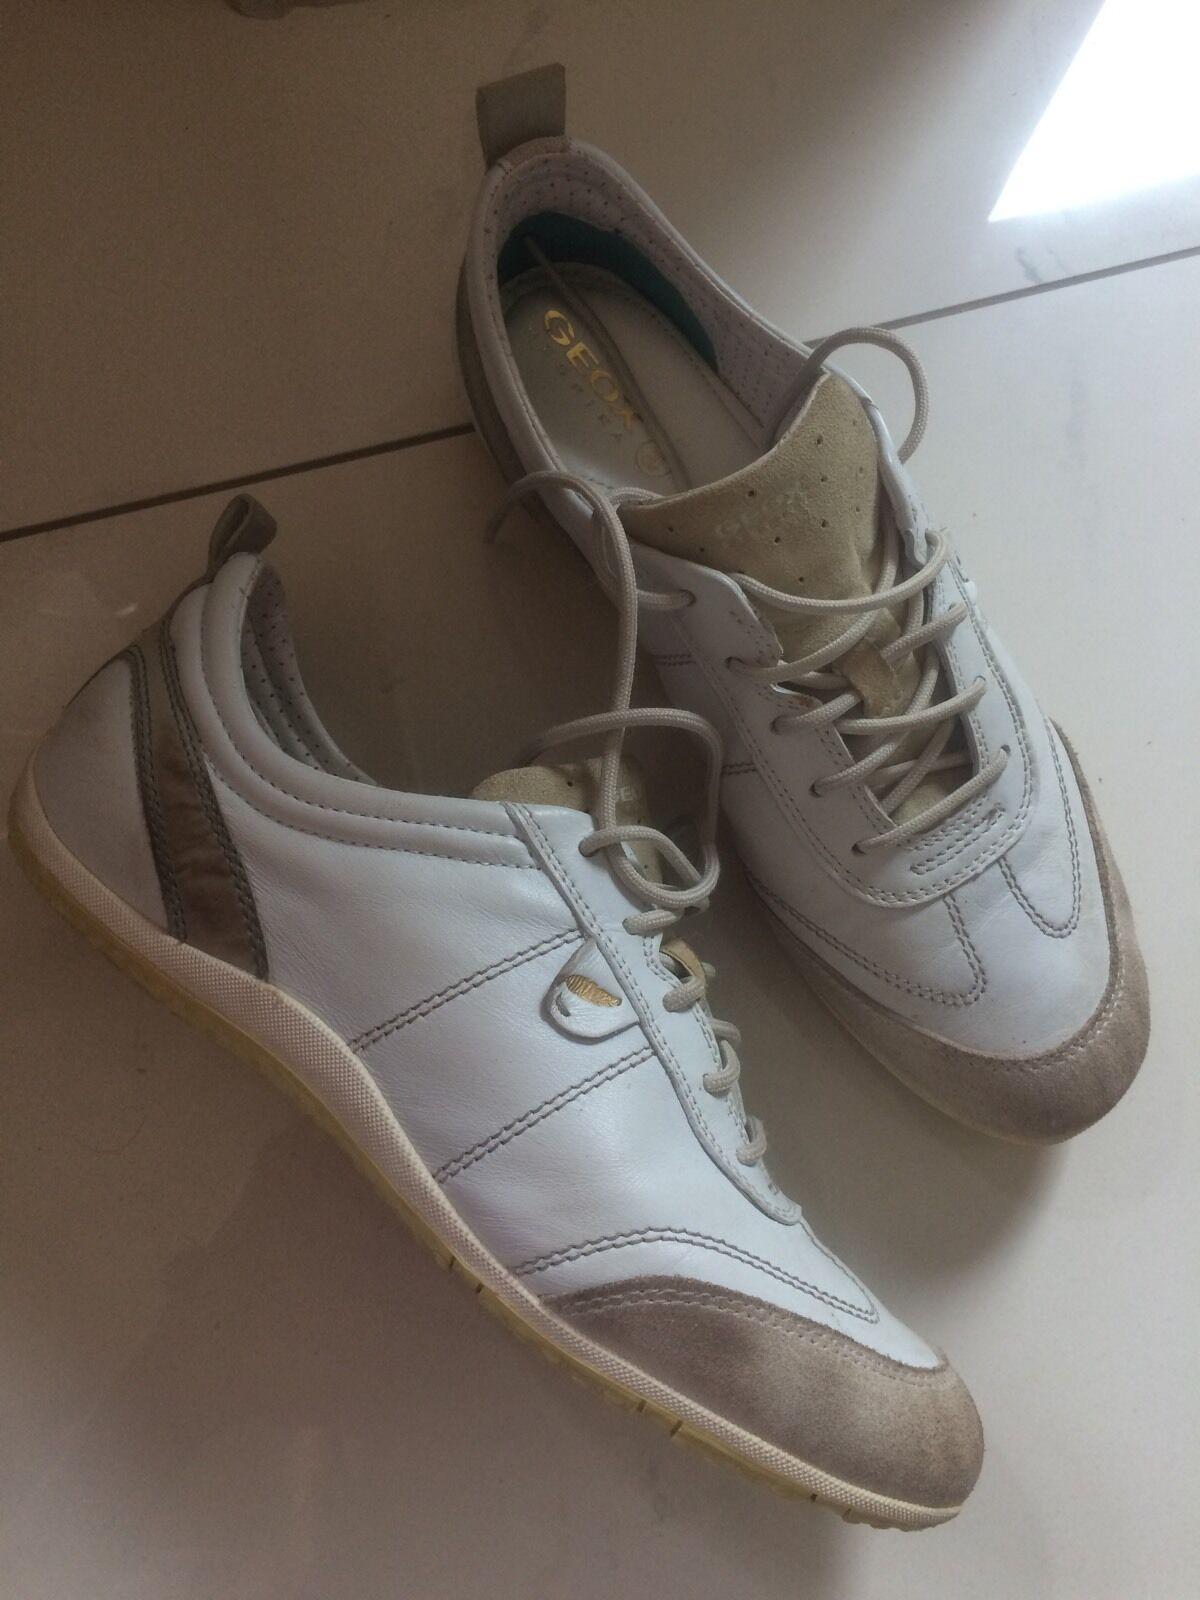 Geox VEGA Damen Turnschuhe D3209A Weiß Beige, EU 39 Schuhe Halbschuhe